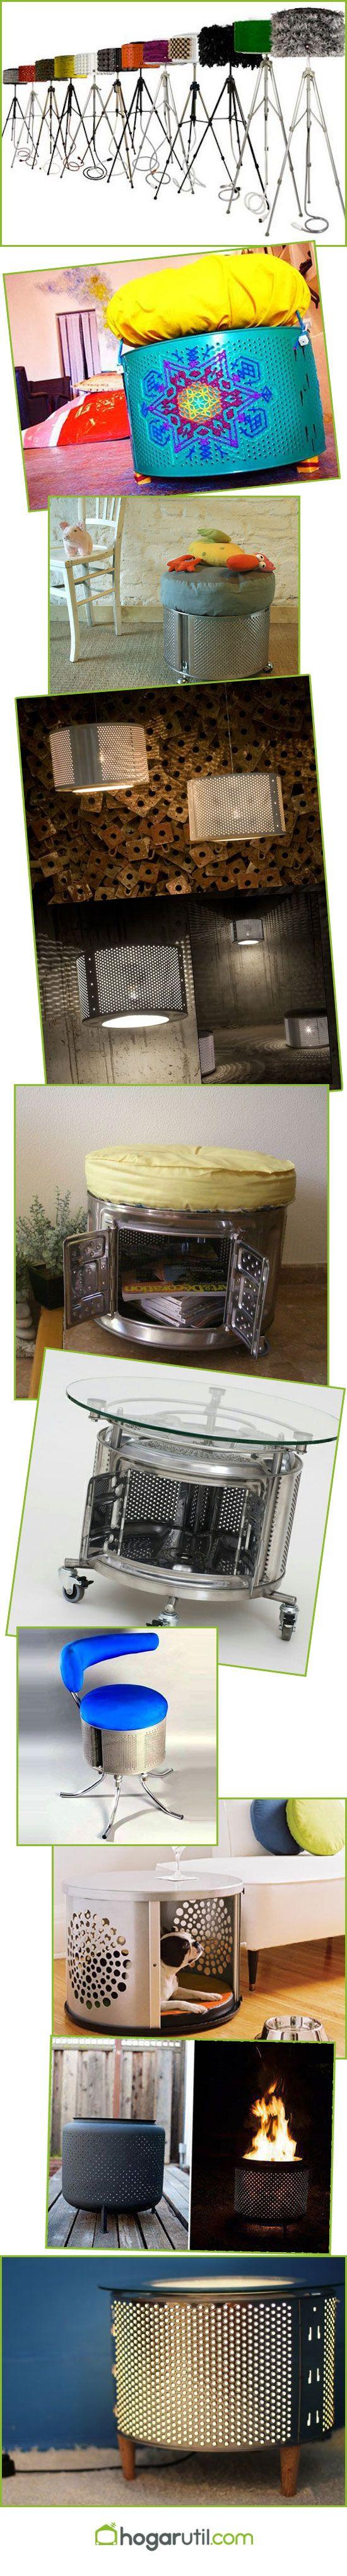 Reciclar tambor de lavadora 10 ideas para reciclar tambores de lavadora